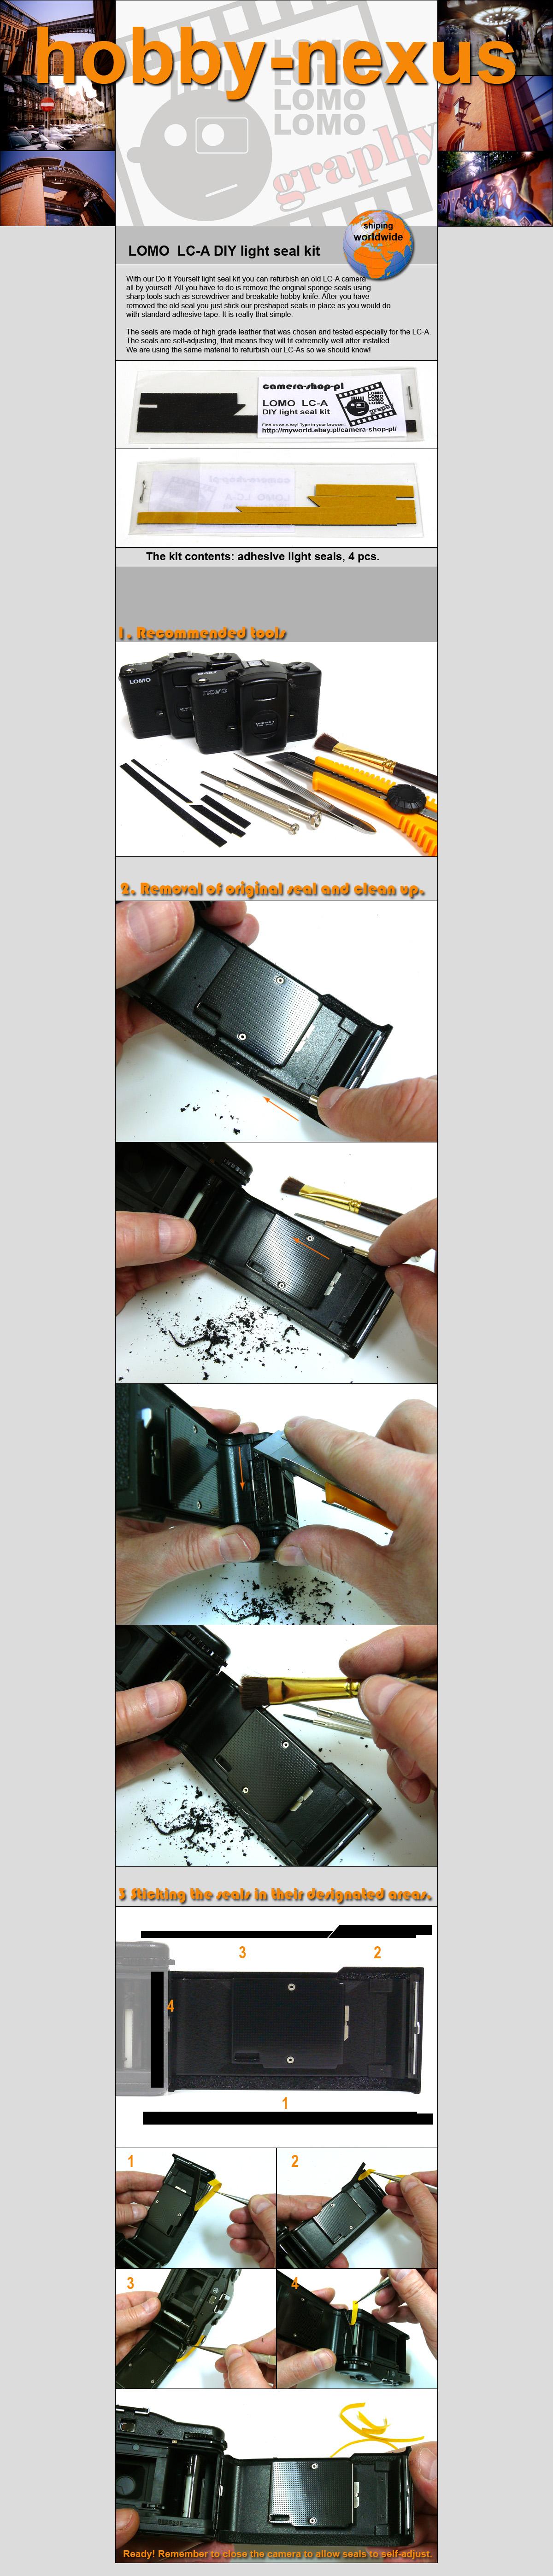 LOMO  LC-A DIY light seal kit Lomography